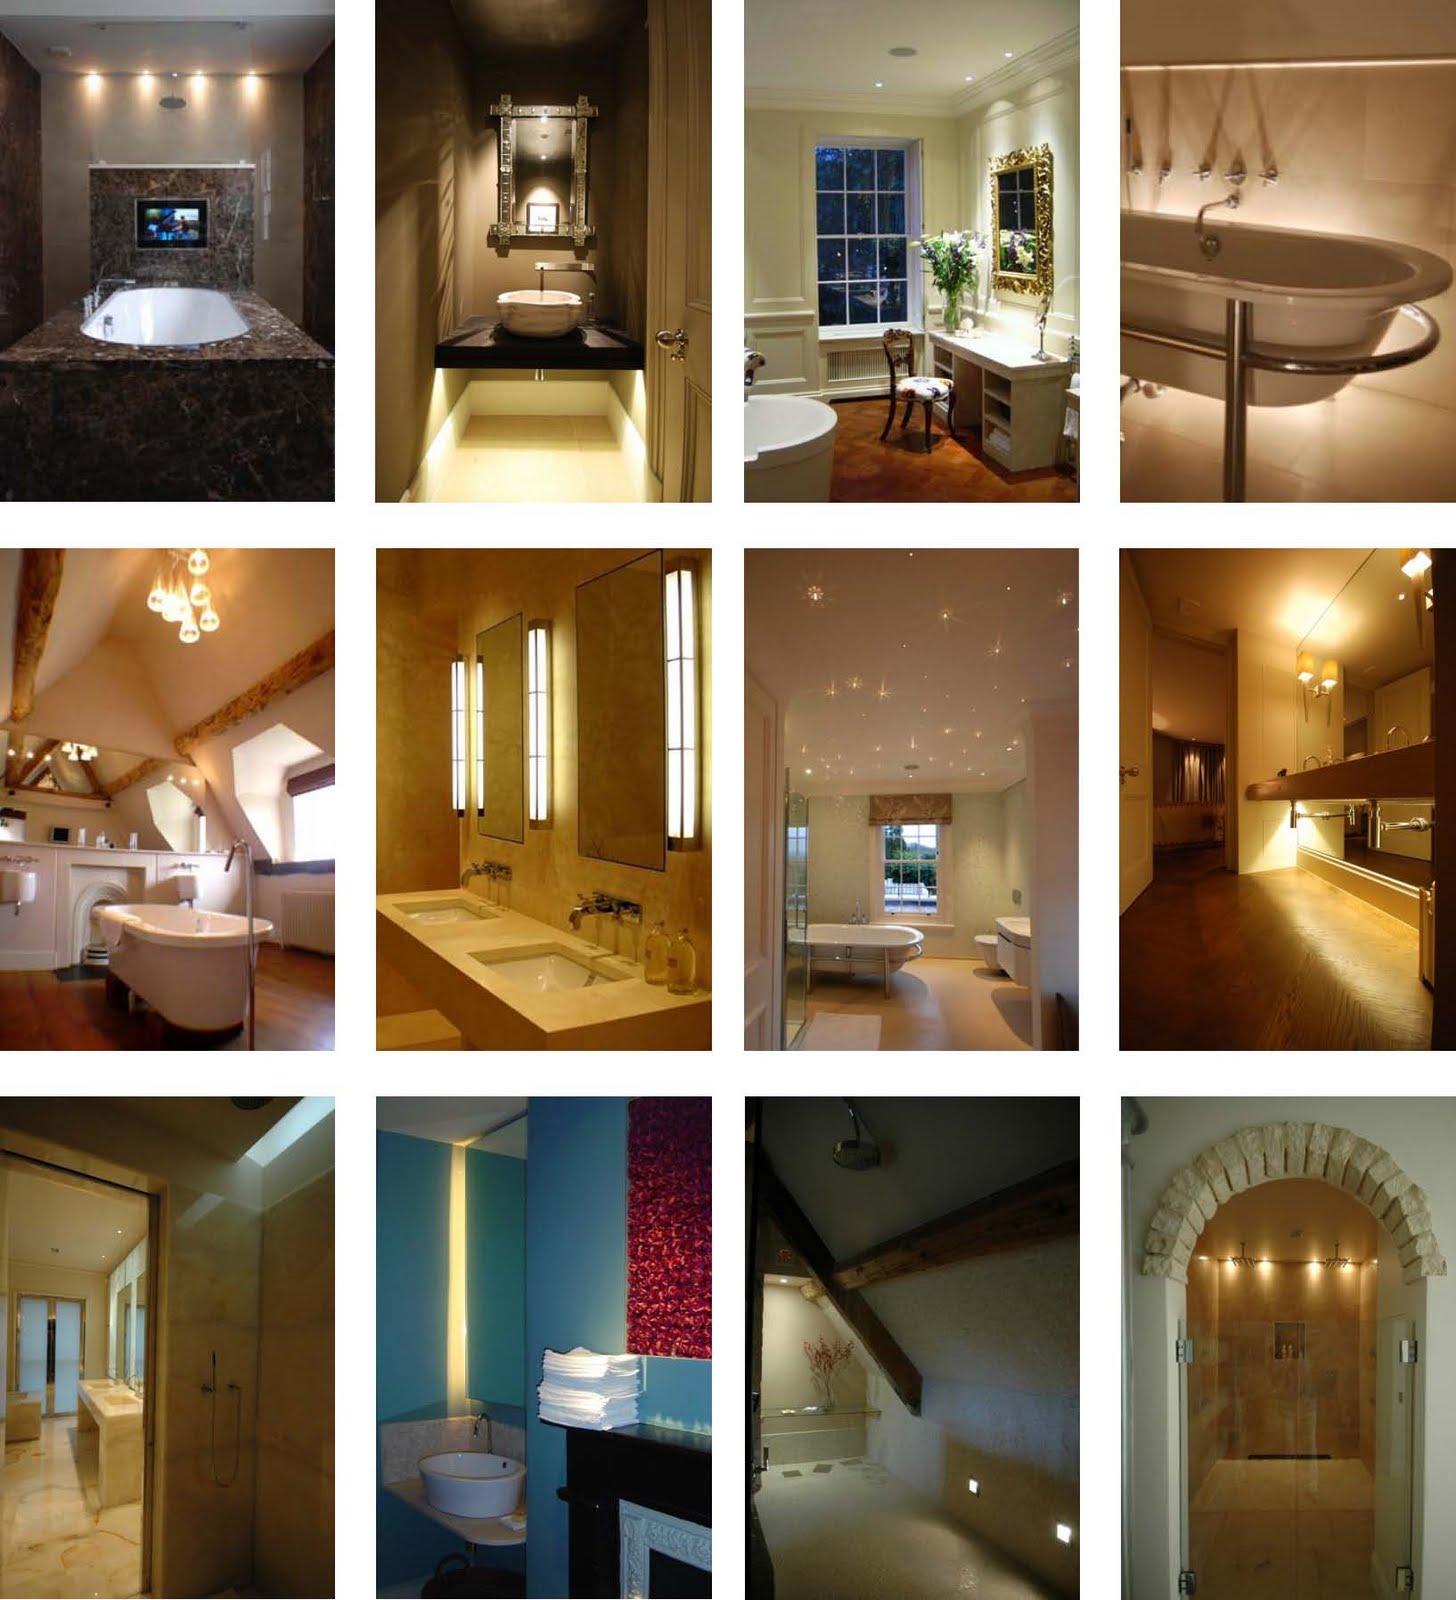 Iluminacion Baño Ideas:iluminacion-cuarto-de-bañojpg